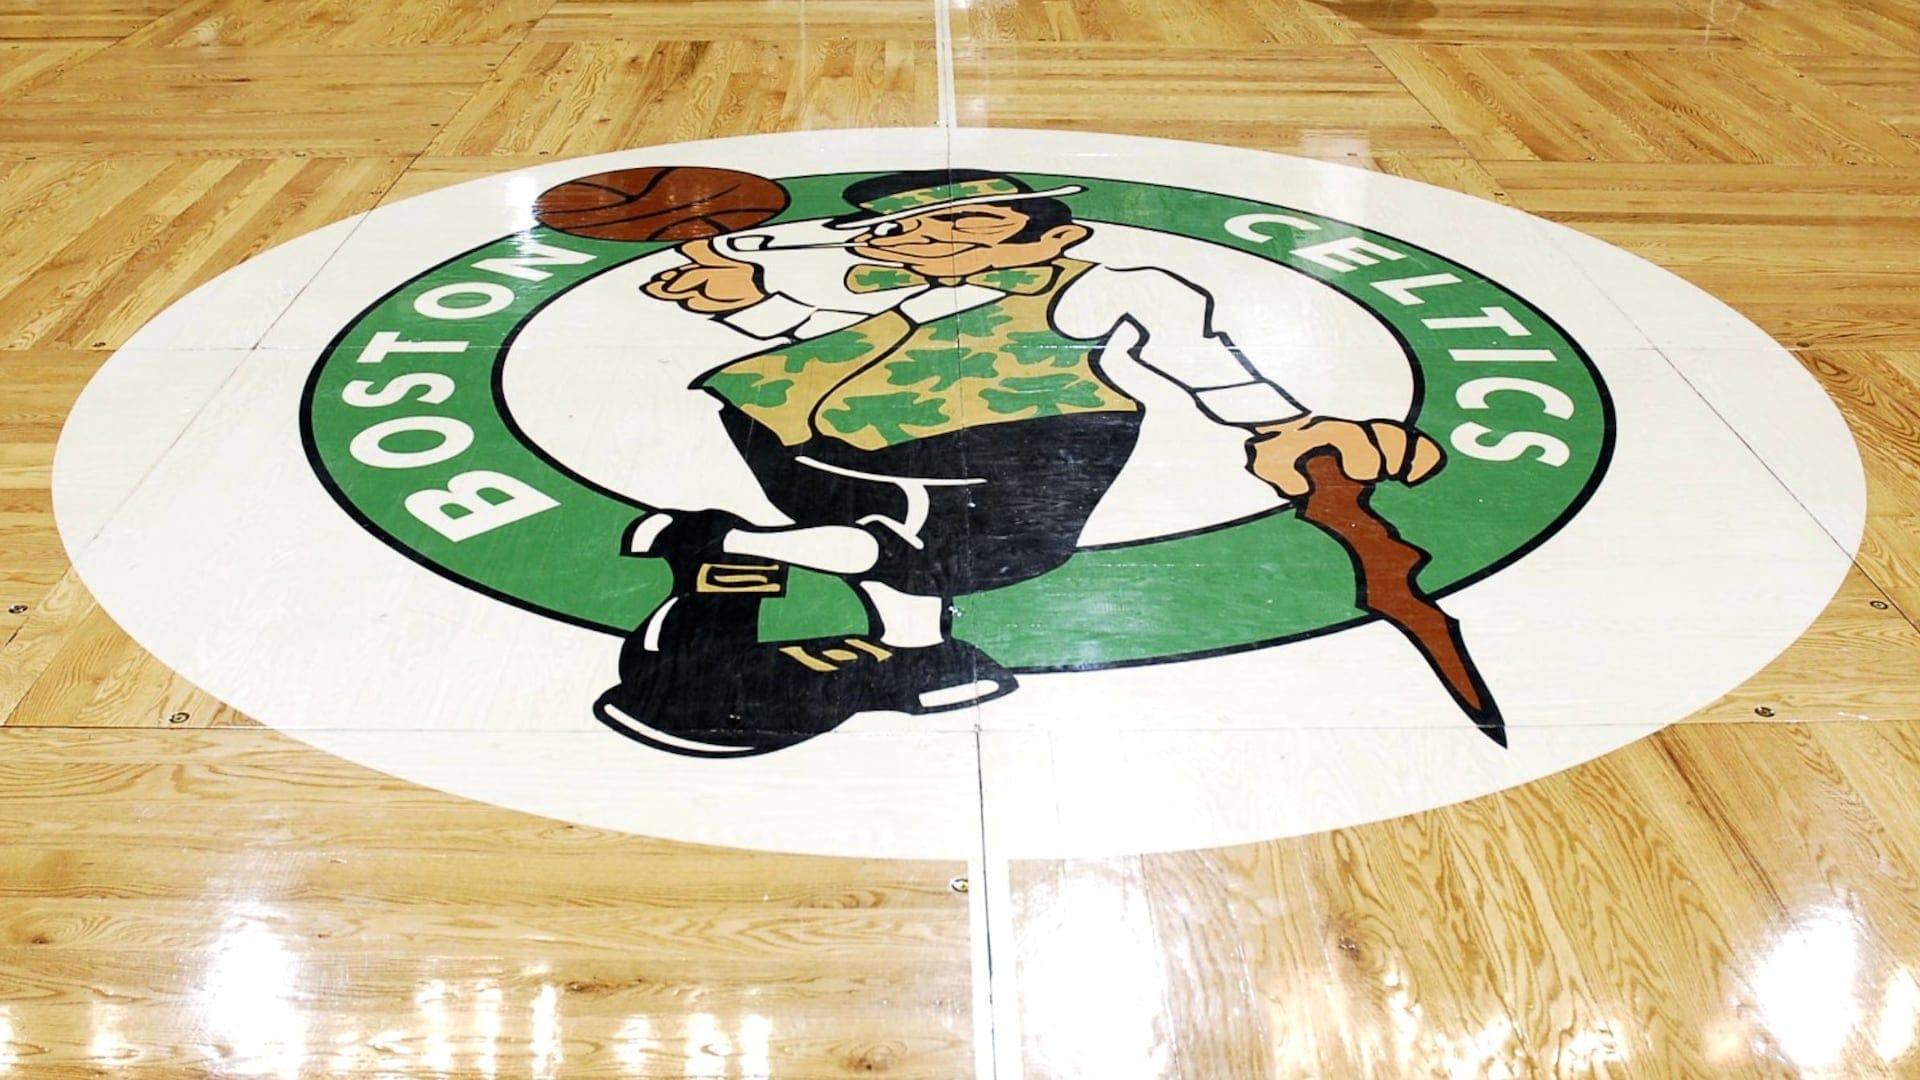 Boston Celtics player tests positive for COVID-19